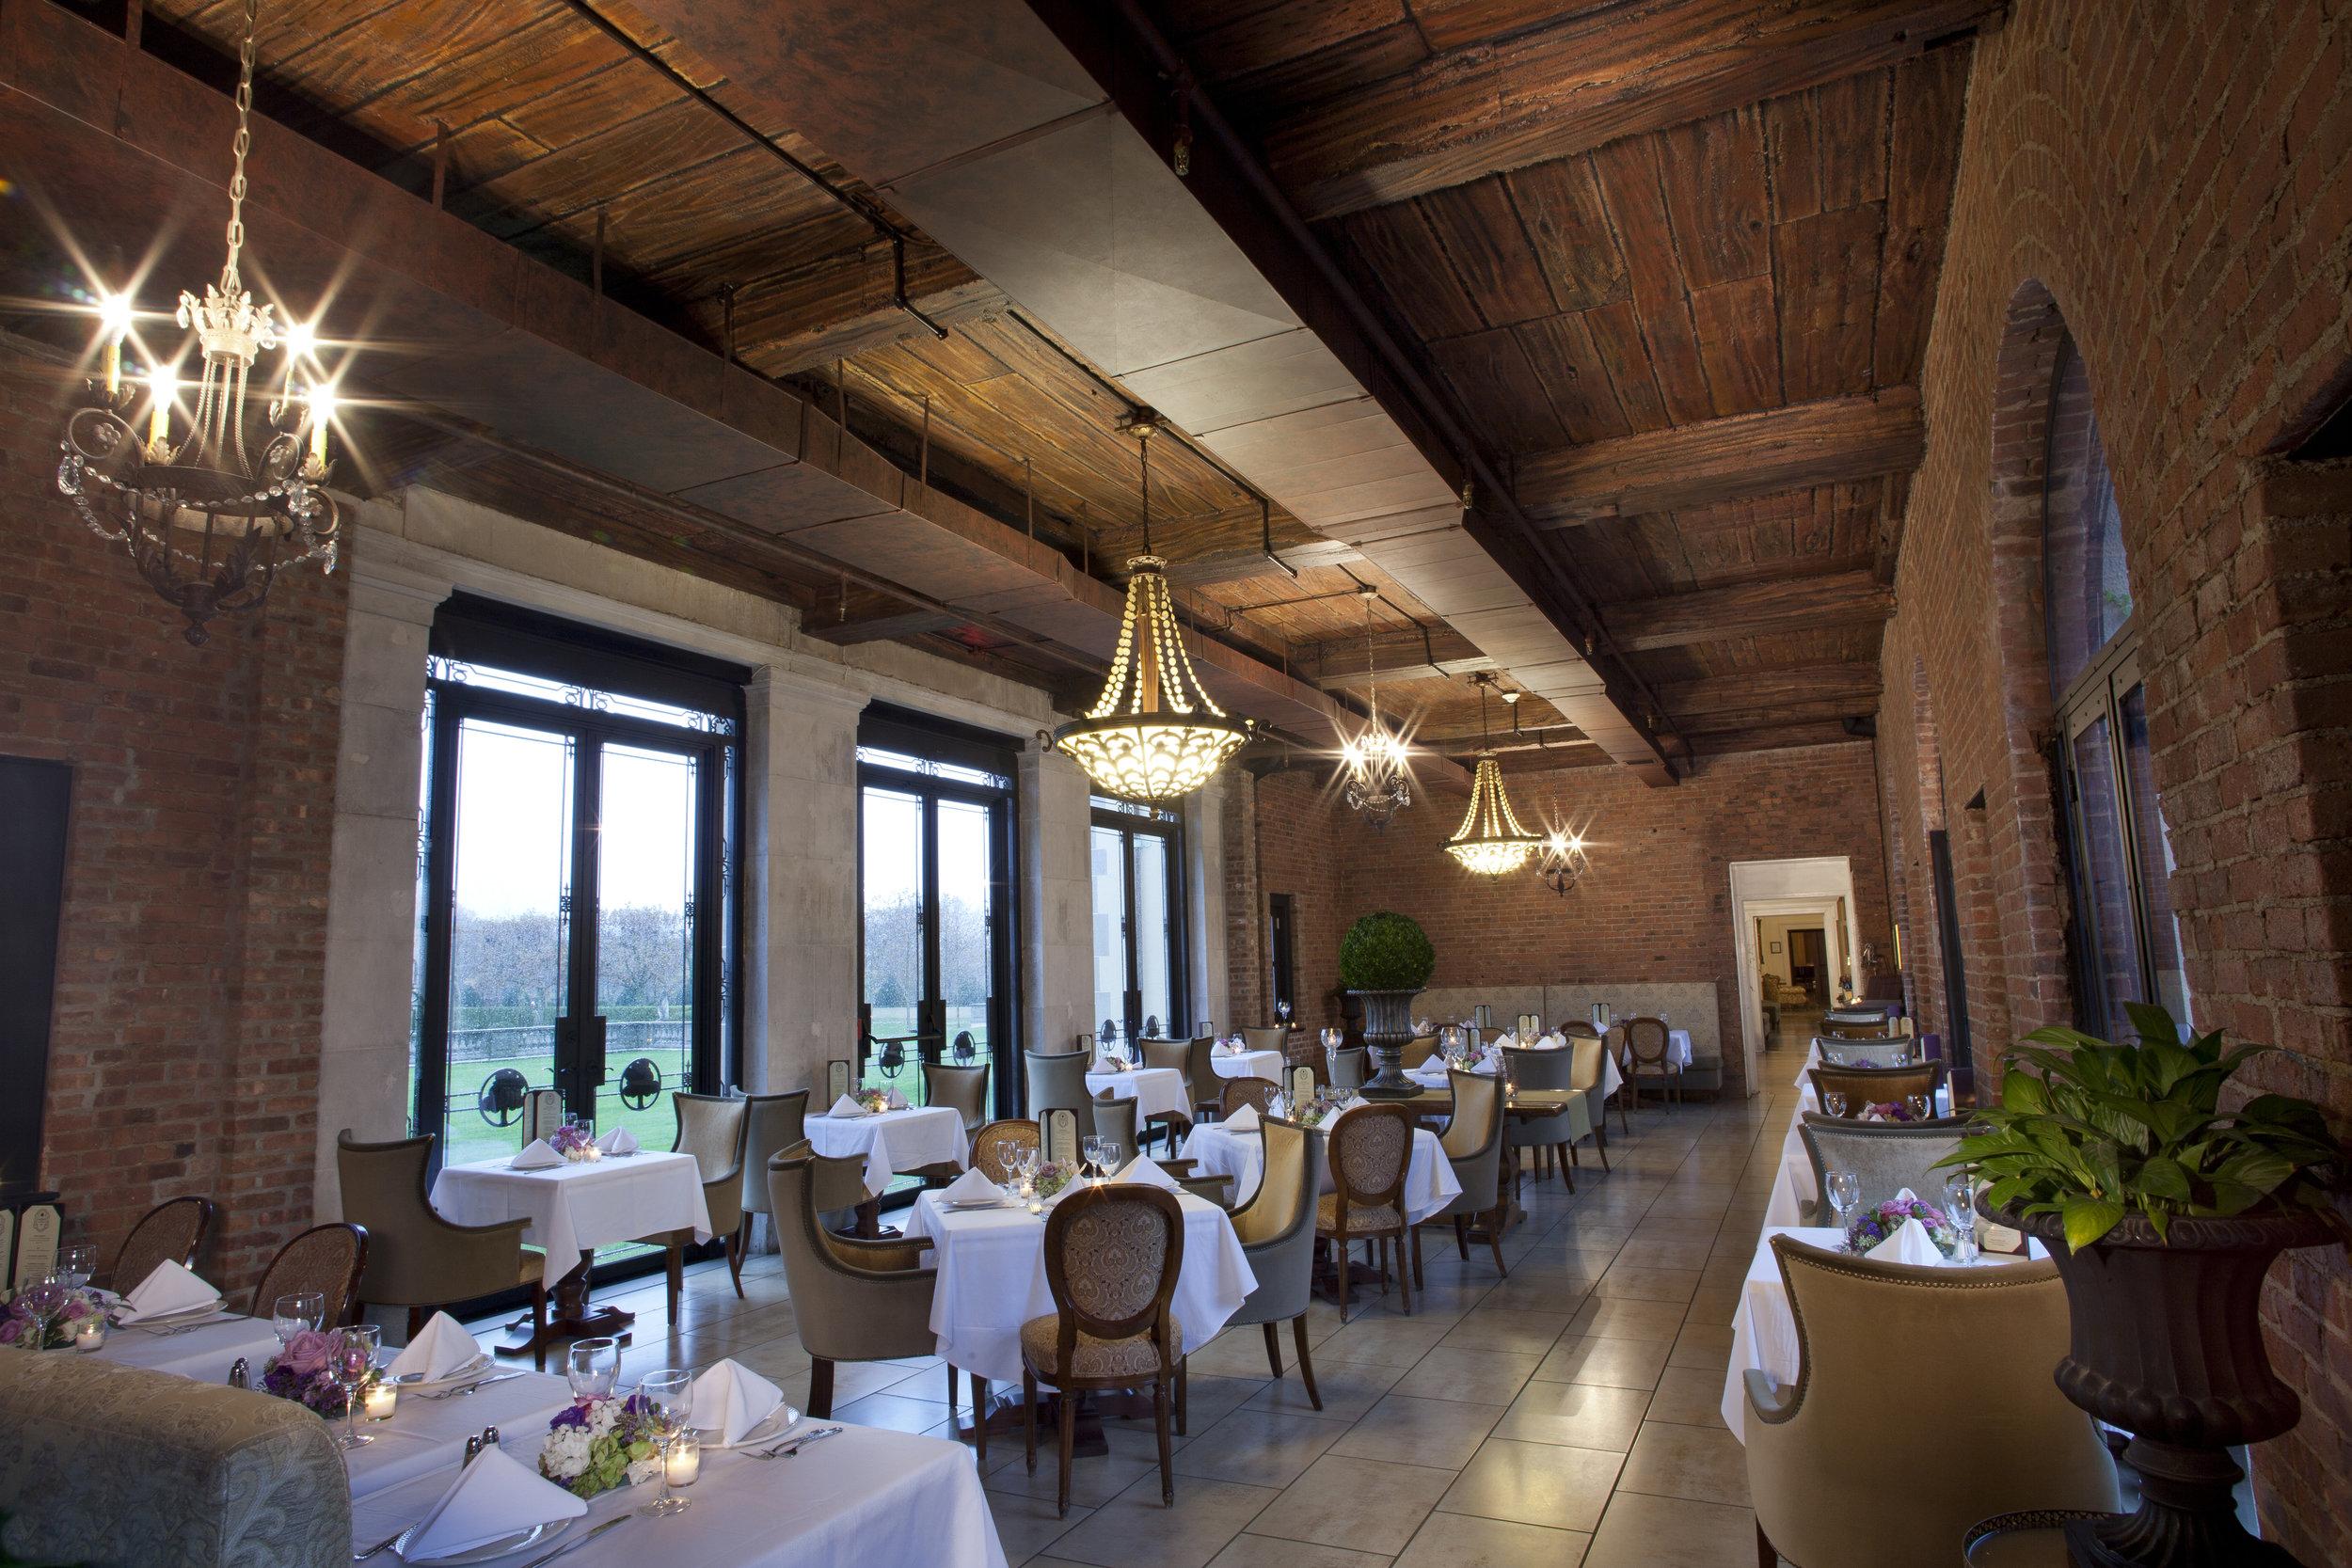 OHEKA Bar & Restaurant Dining Room_1_Brett Matthews Photography.jpg